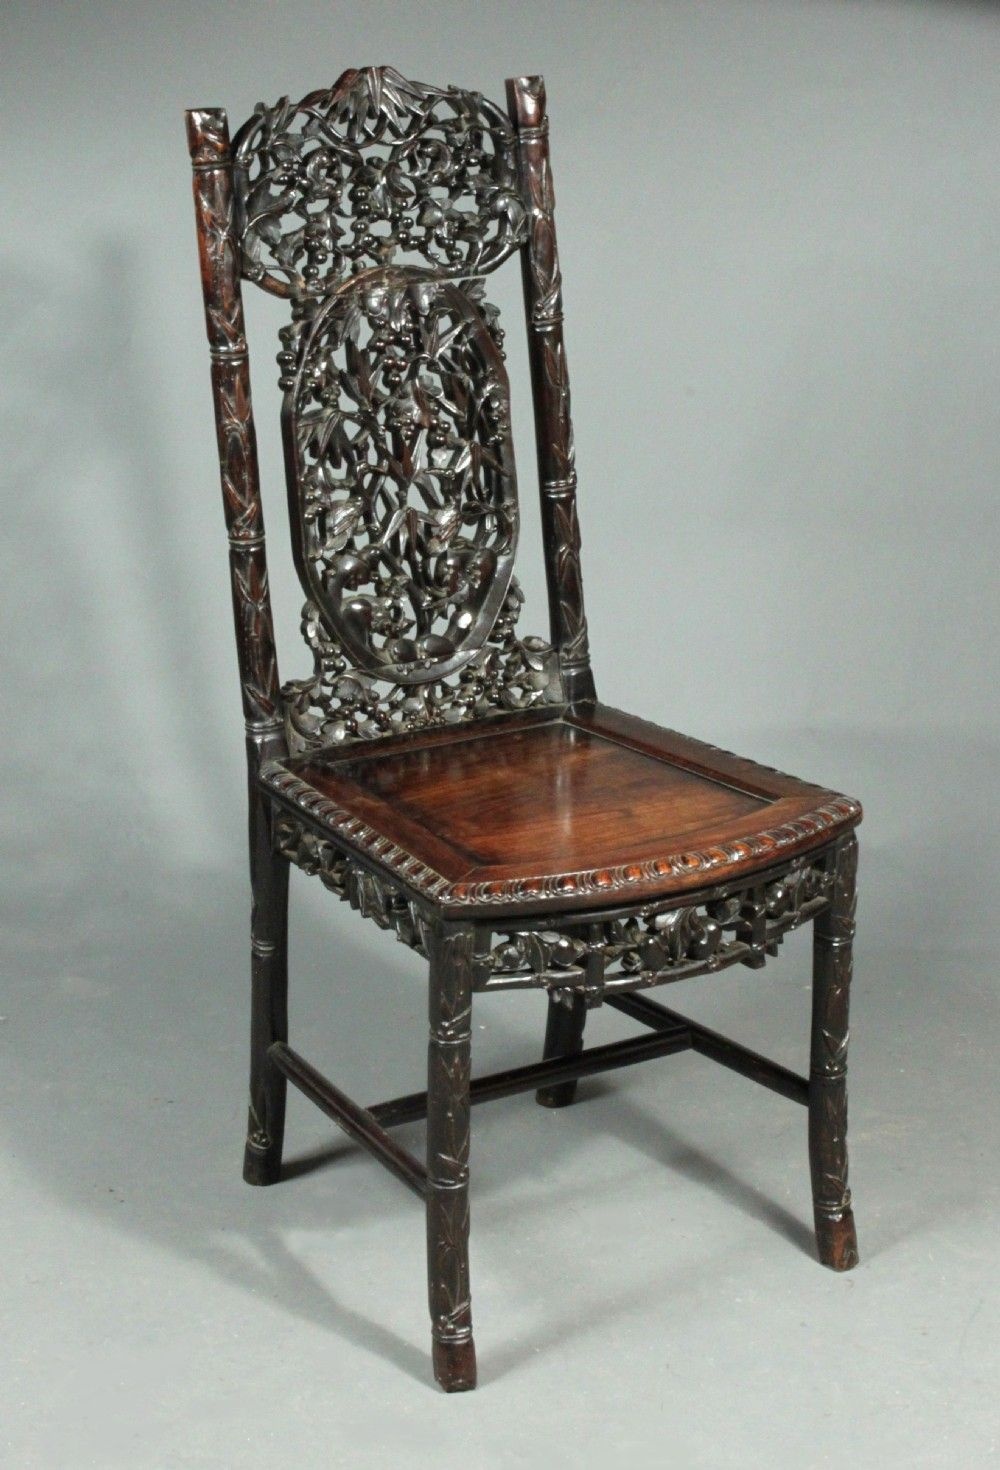 ANTIQUE CHINESE CHAIR - ANTIQUE CHINESE CHAIR Furniture Pinterest Woods